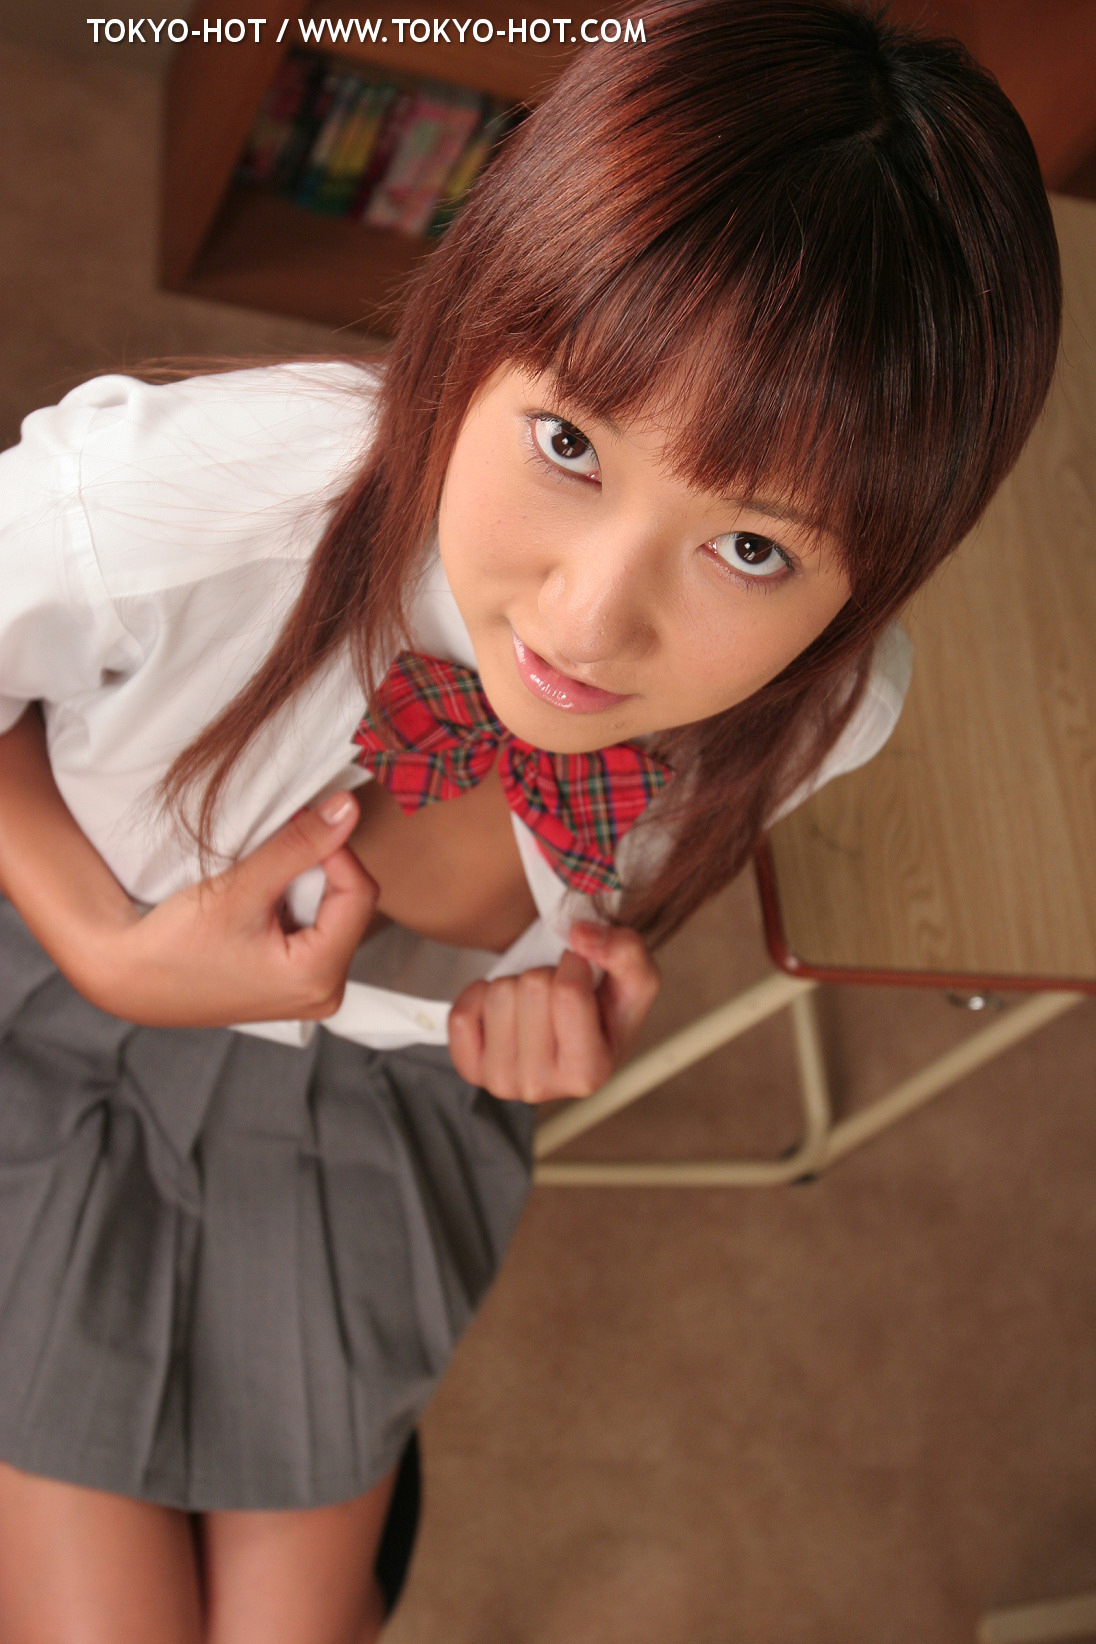 e048junna_akimoto0005-jpg [Tokyo-Hot] 2005-10-18 e048 Junna Akimoto 秋元純菜 [433P225MB]